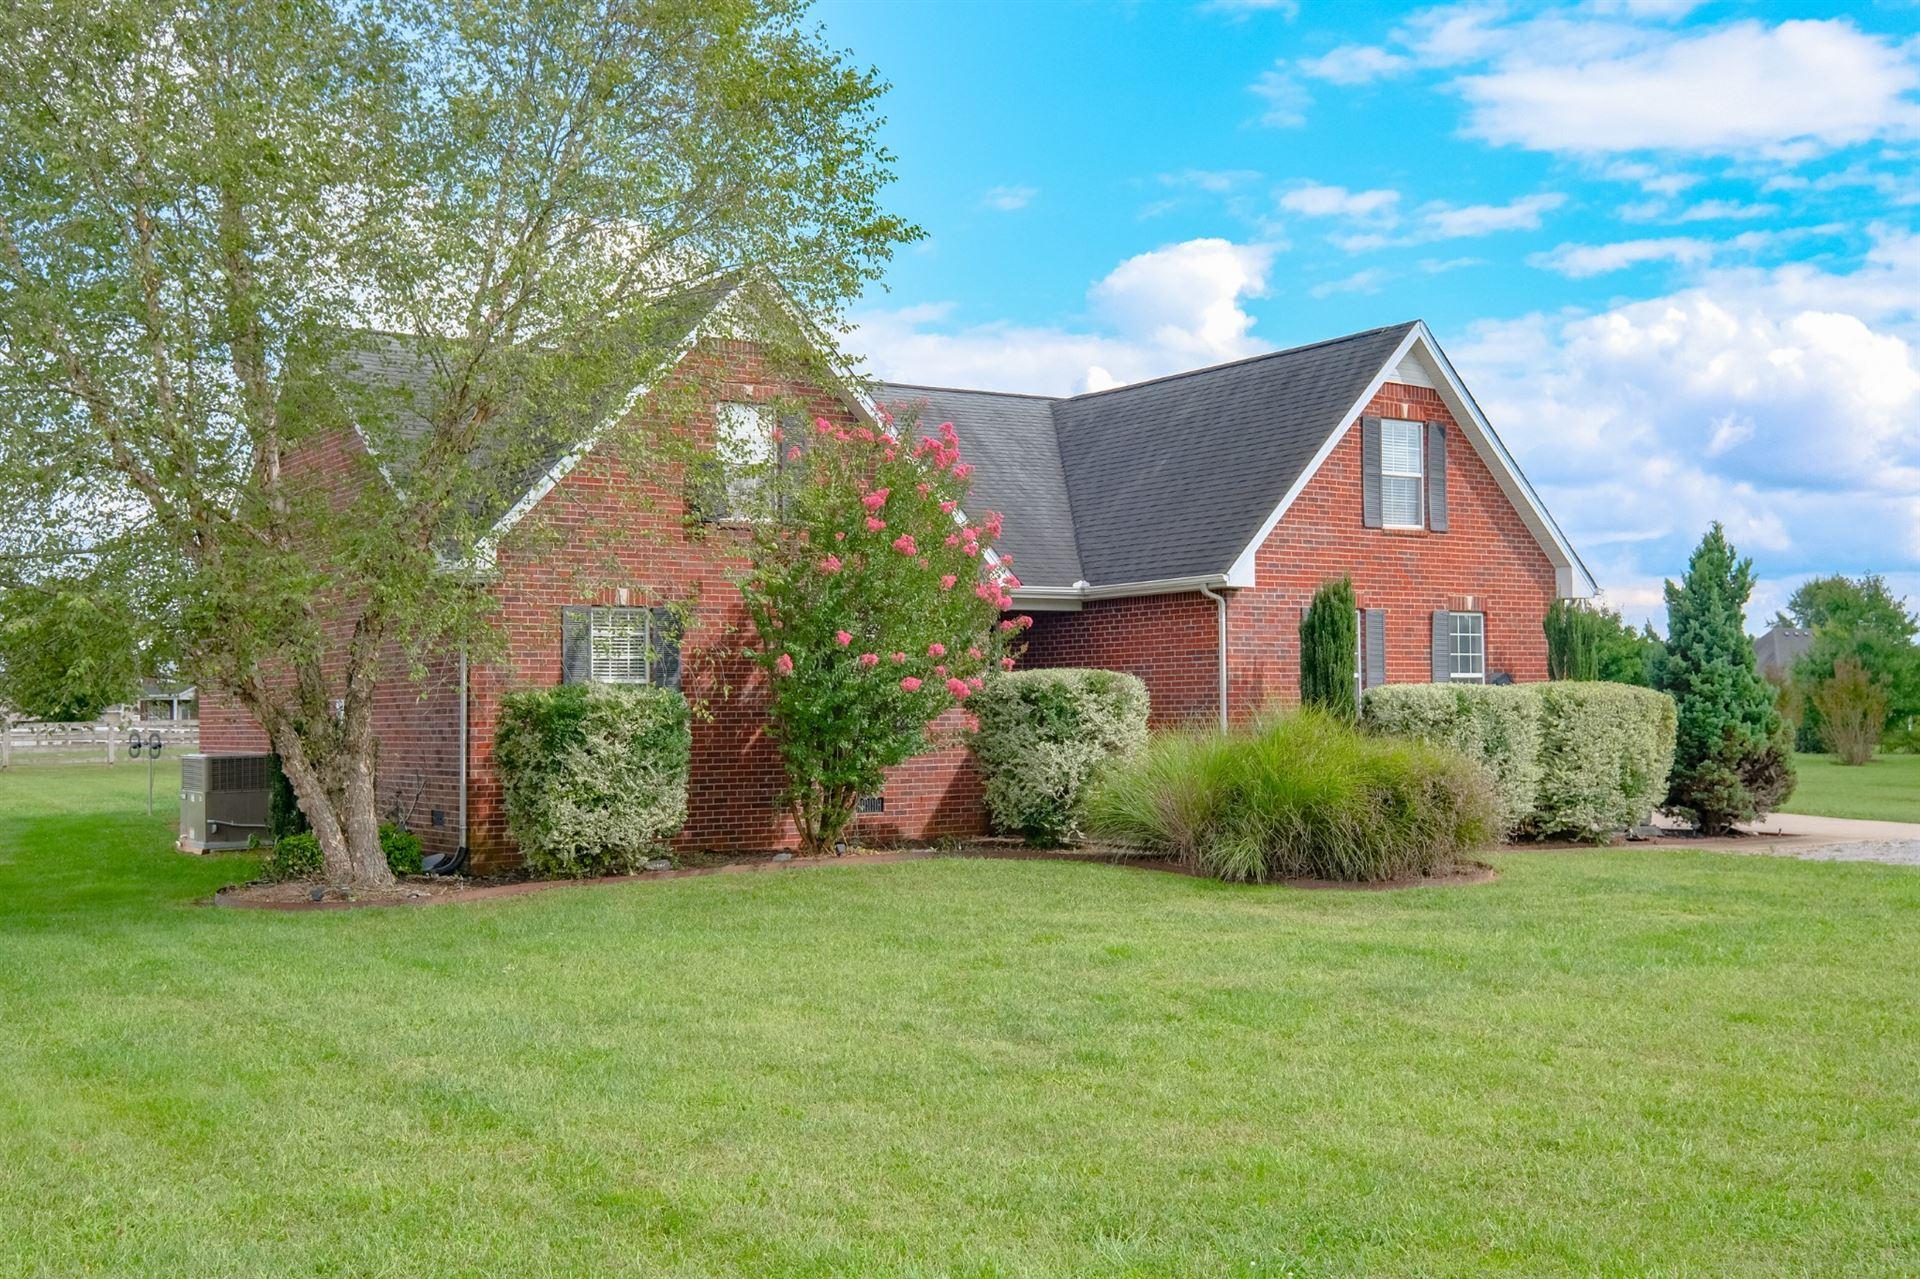 Photo of 7278 Powells Chapel Rd, Murfreesboro, TN 37129 (MLS # 2292245)